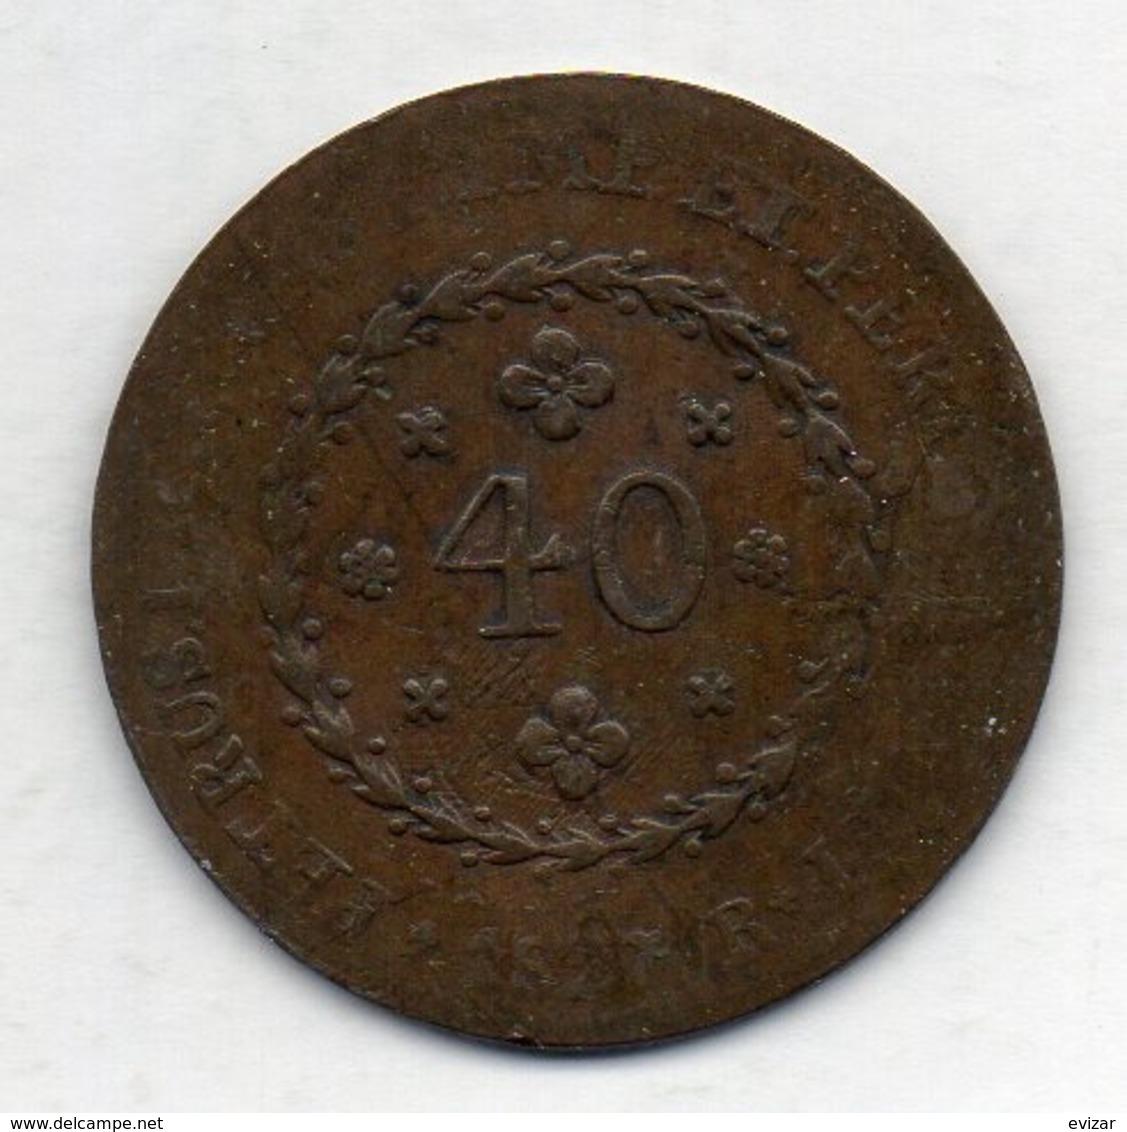 BRAZIL - MINAS GERAIS, 40 Reis, 1827 - R, Copper, KM #363.1 - Brazil